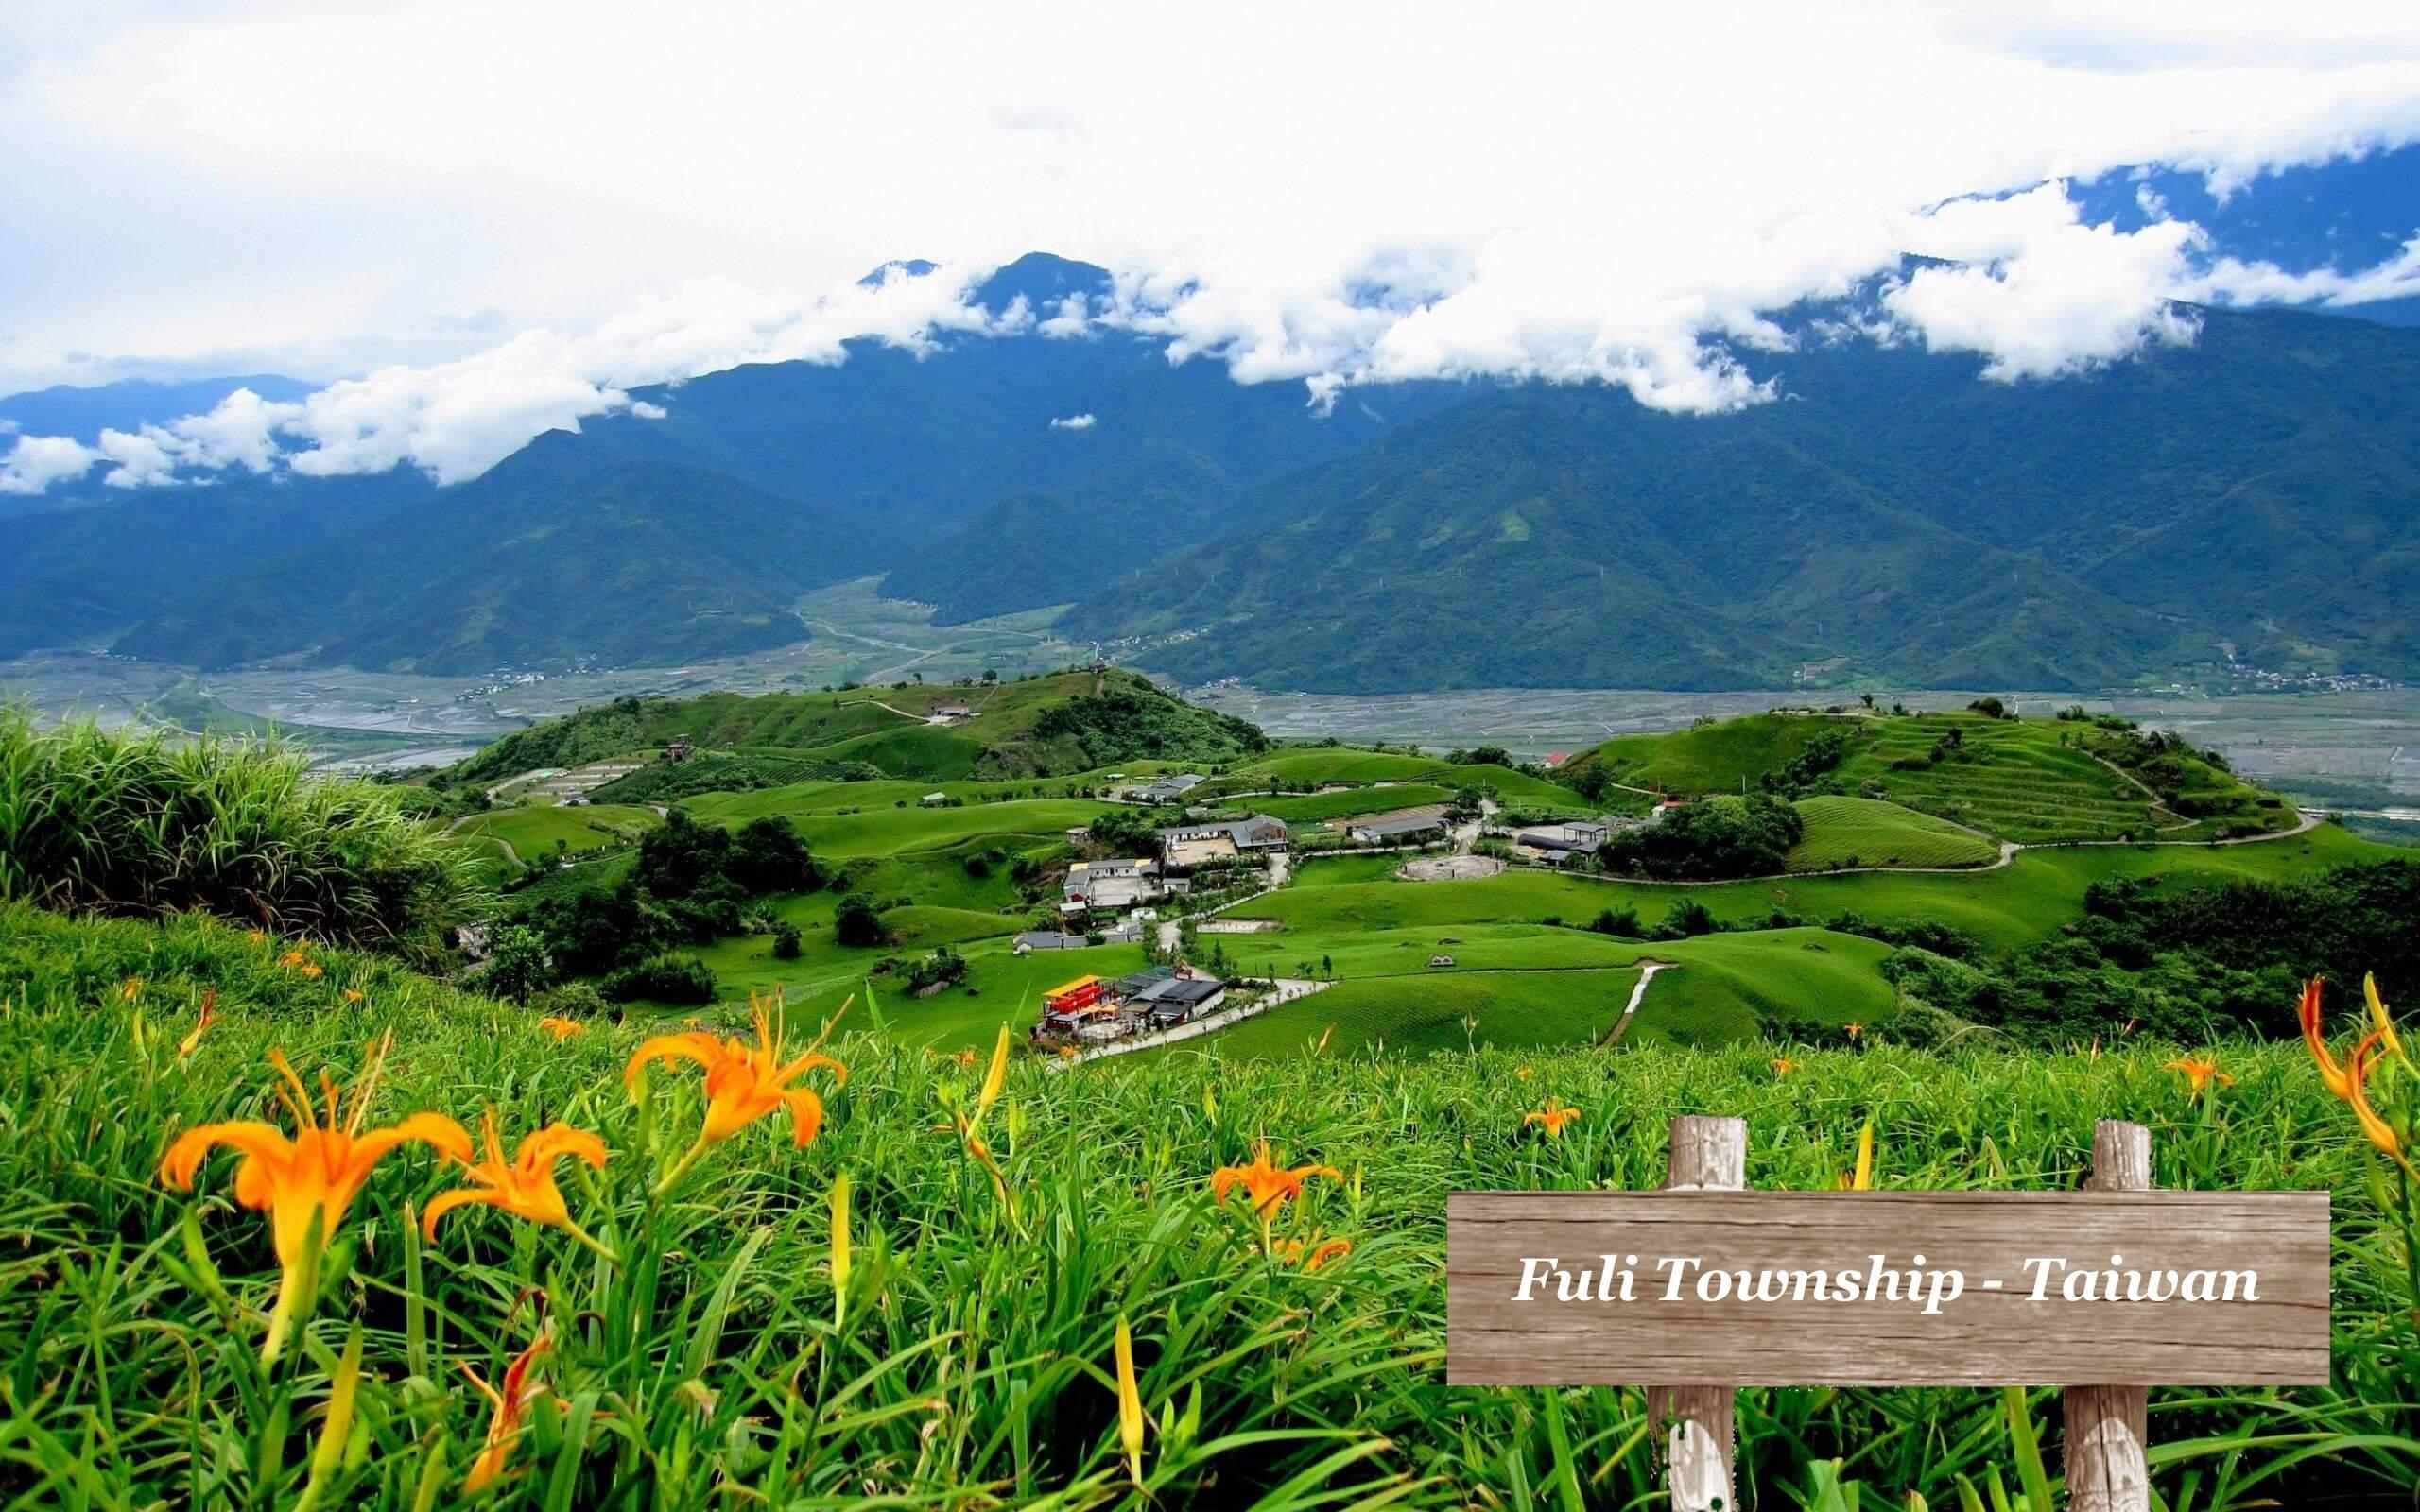 Fuli Township, Taiwan